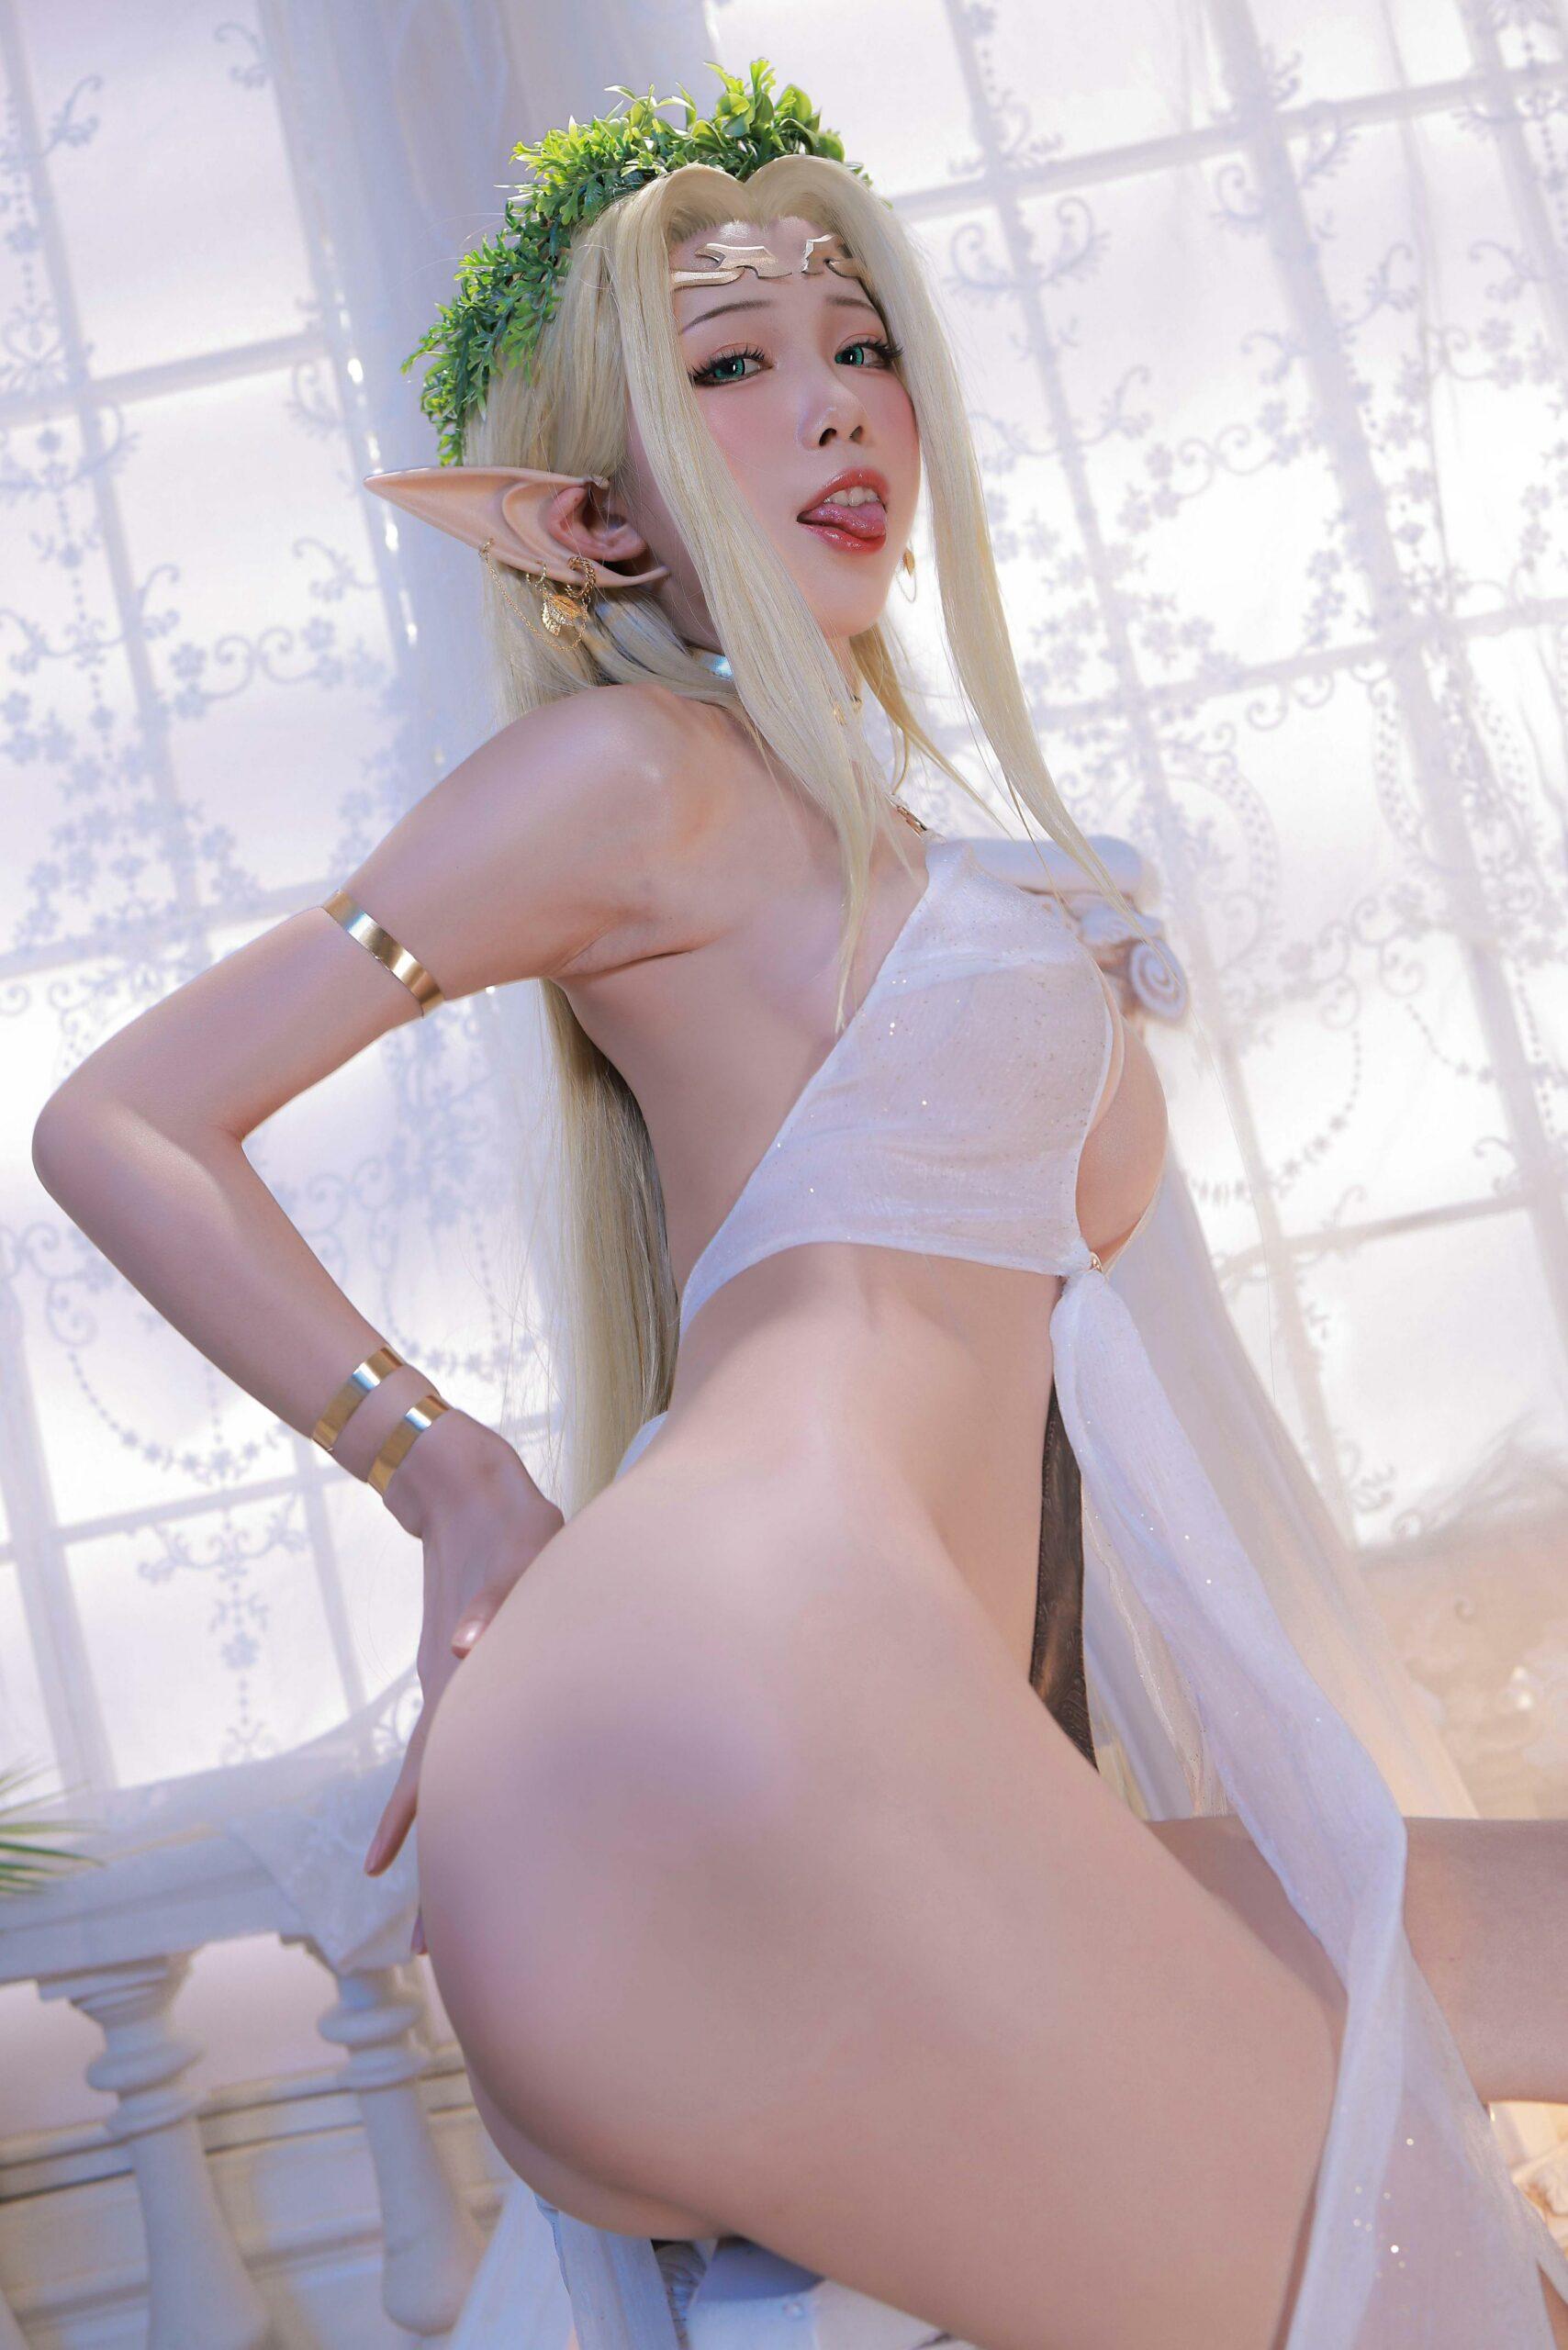 Kuroinu Celestine Cosplay by Aqua 34